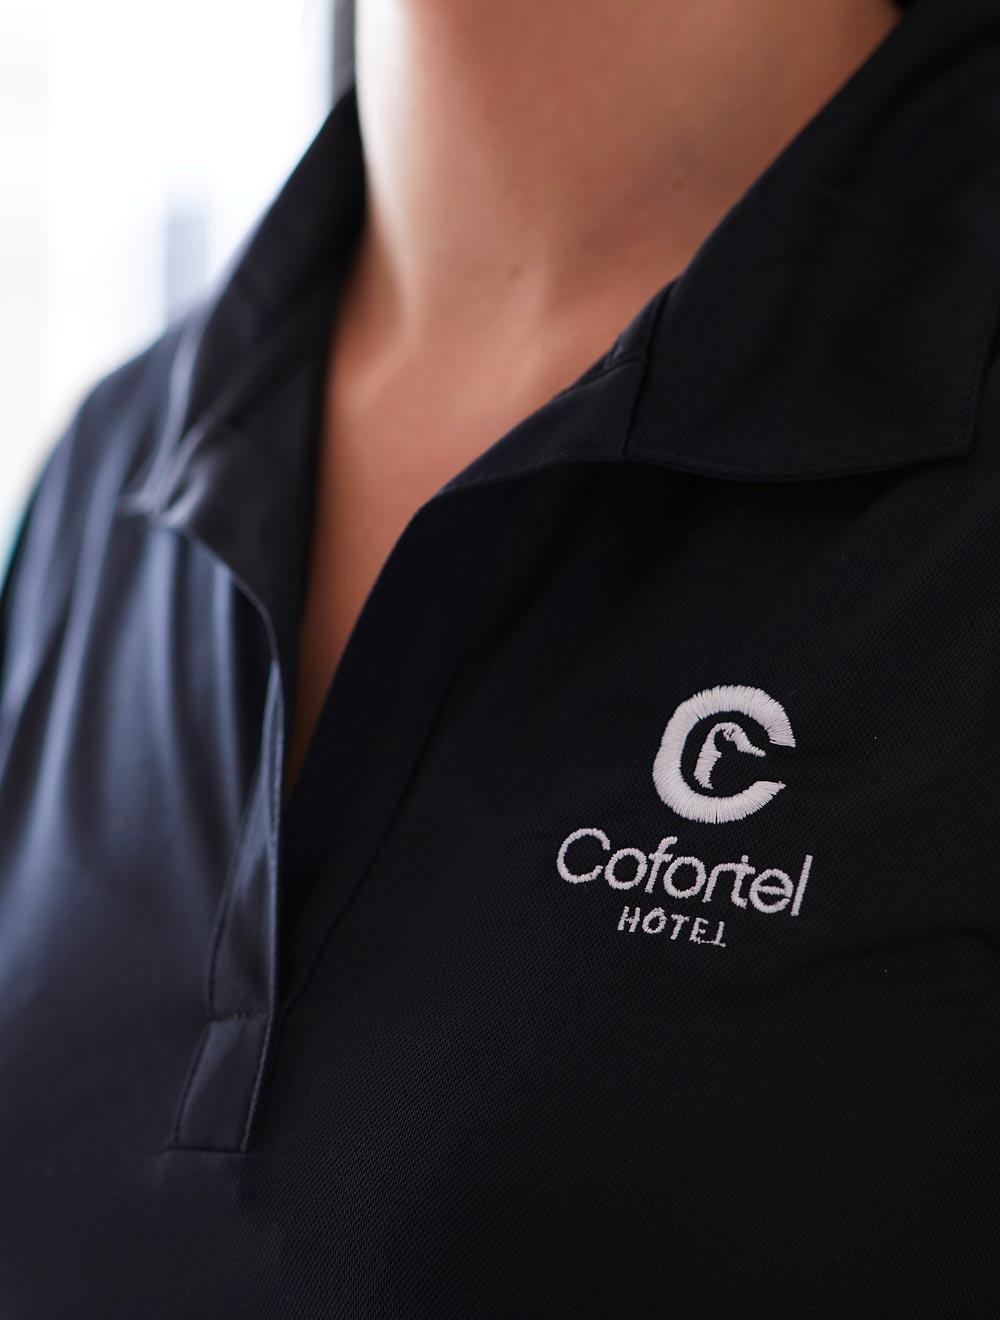 Hôtel Cofortel